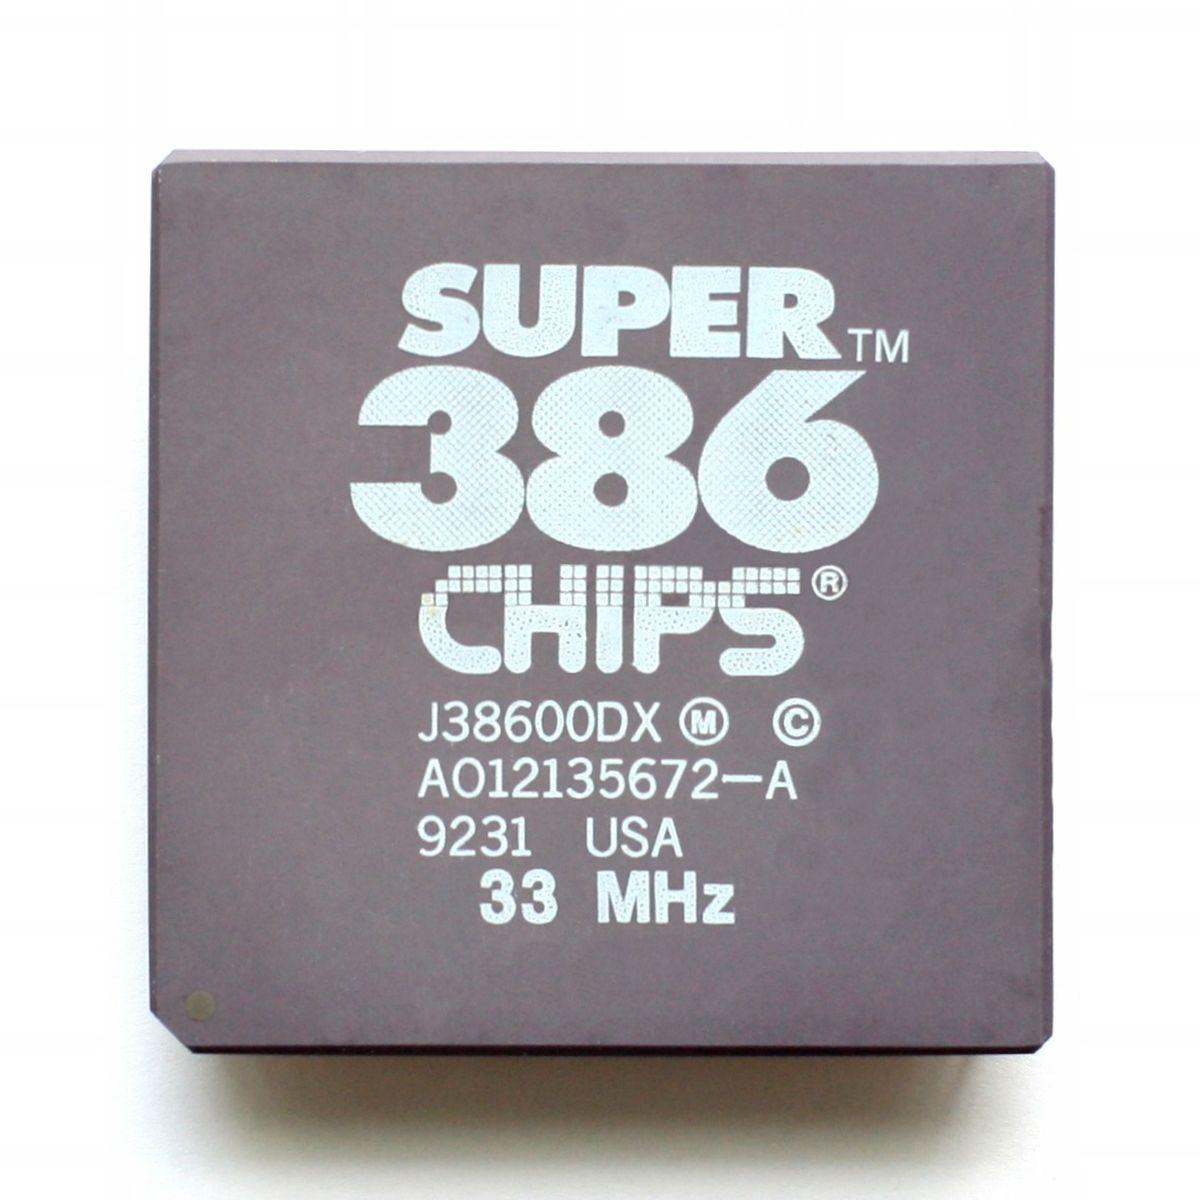 Lleguemos a los 6000 - Página 8 1200px-KL_CHIPS_Super386